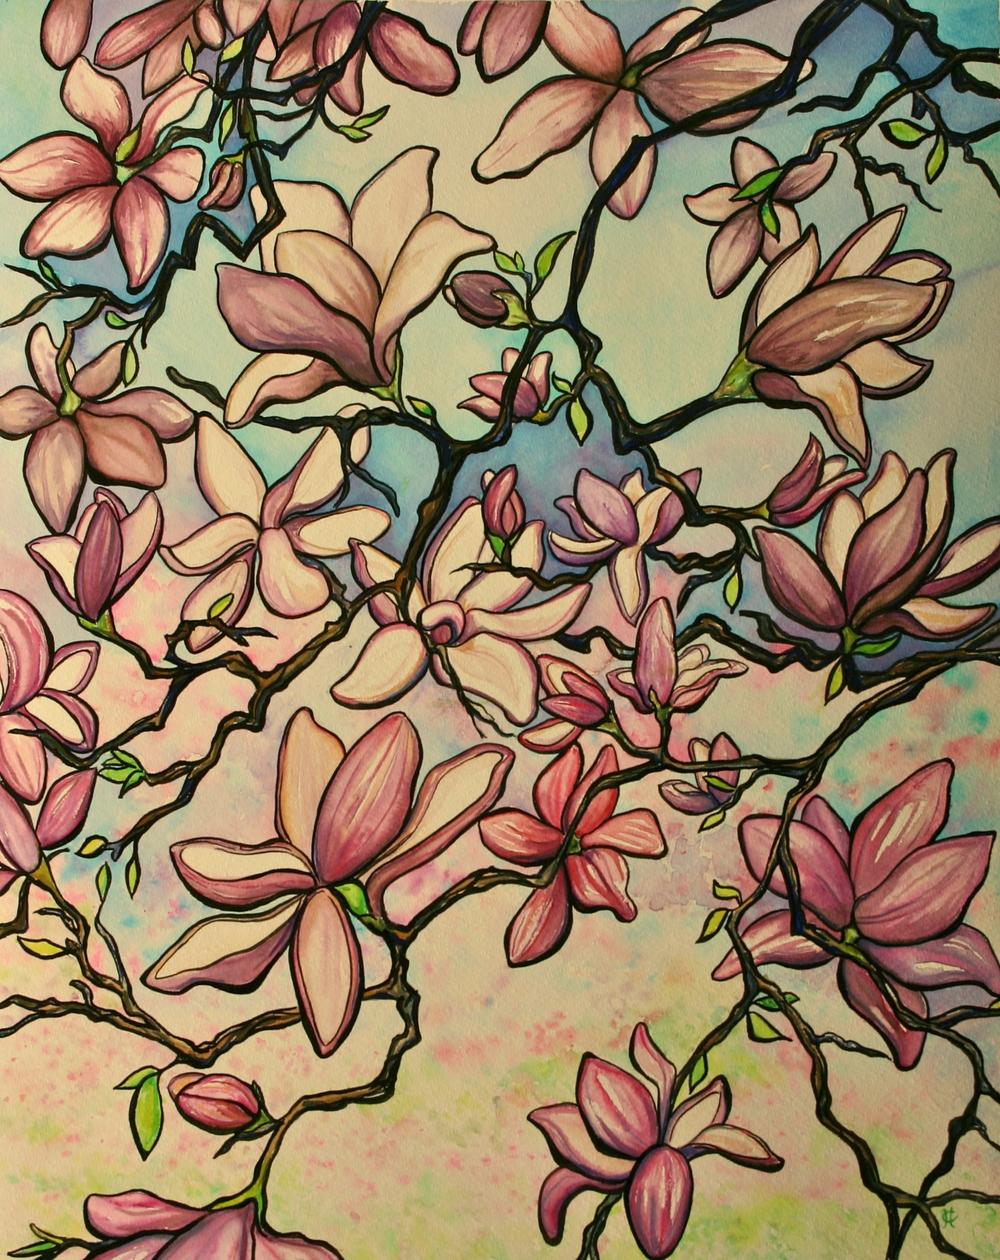 MMMM! Magnolias